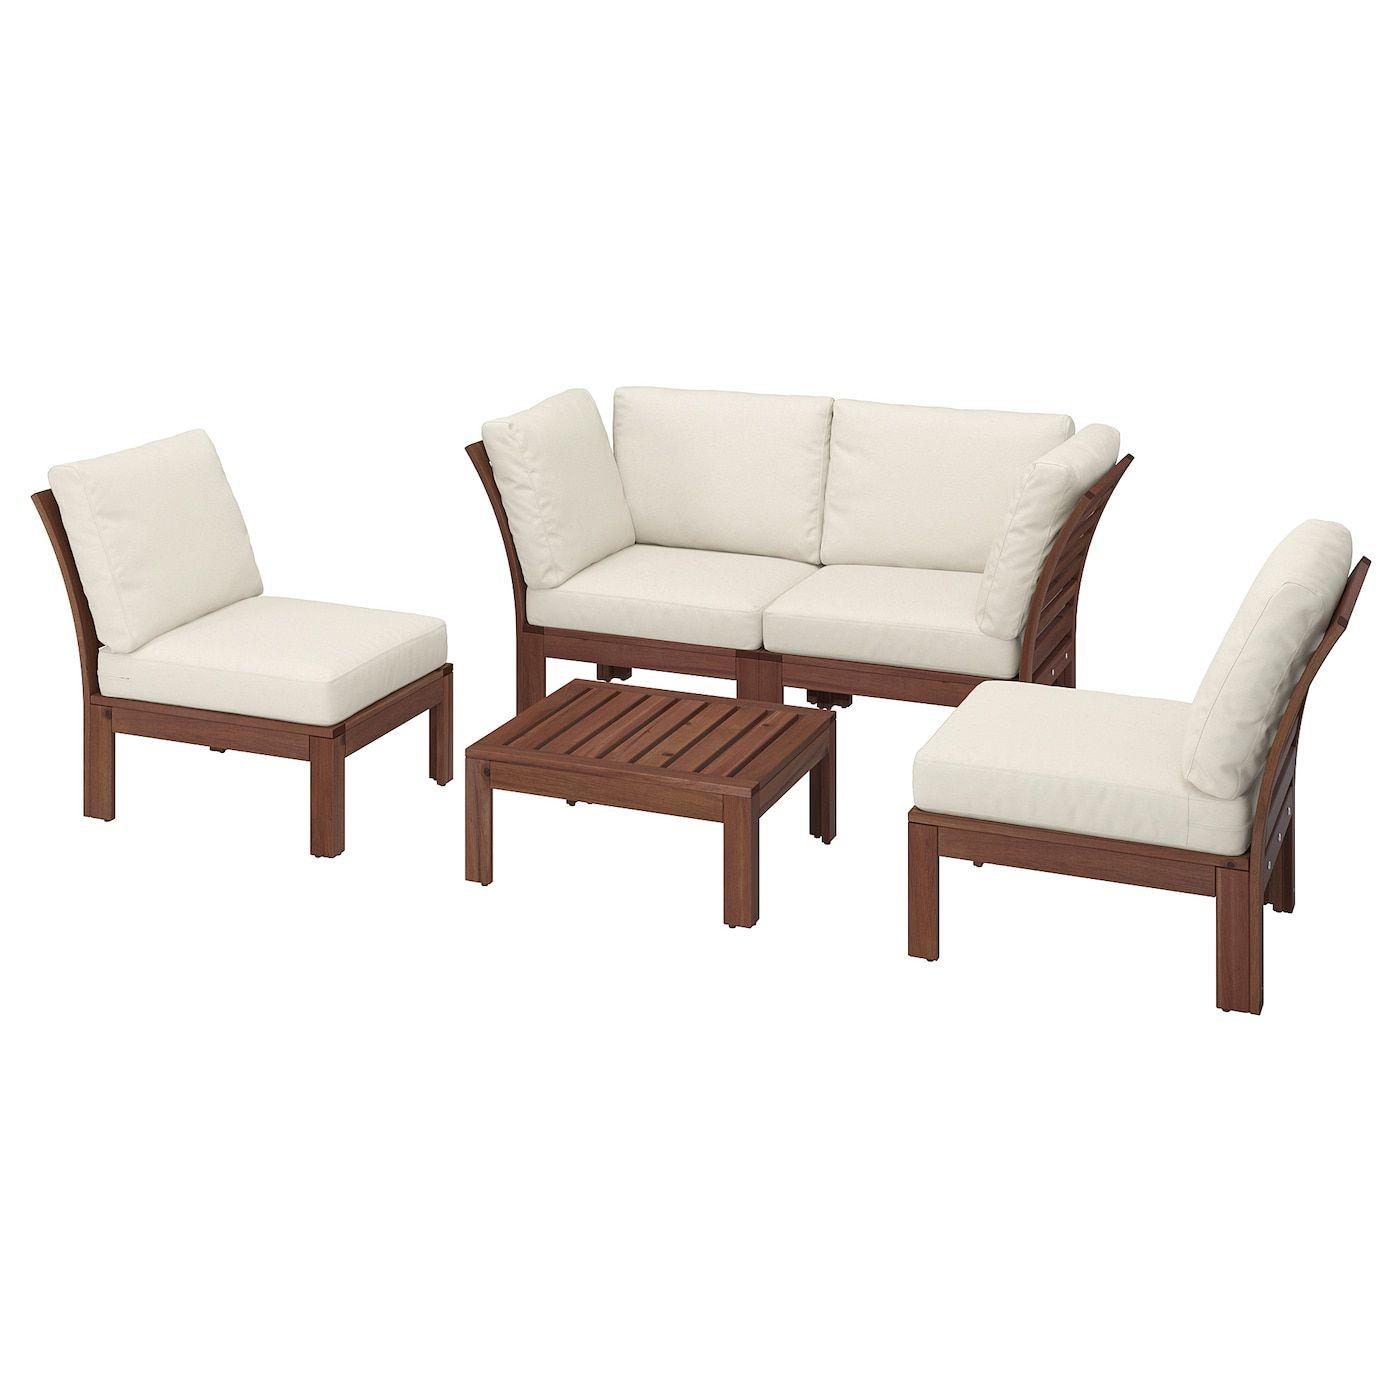 Applaro 4 Seat Conversation Set Outdoor Brown Stained Froson Duvholmen Beige Ikea In 2020 Furniture Ikea Outdoor Ikea